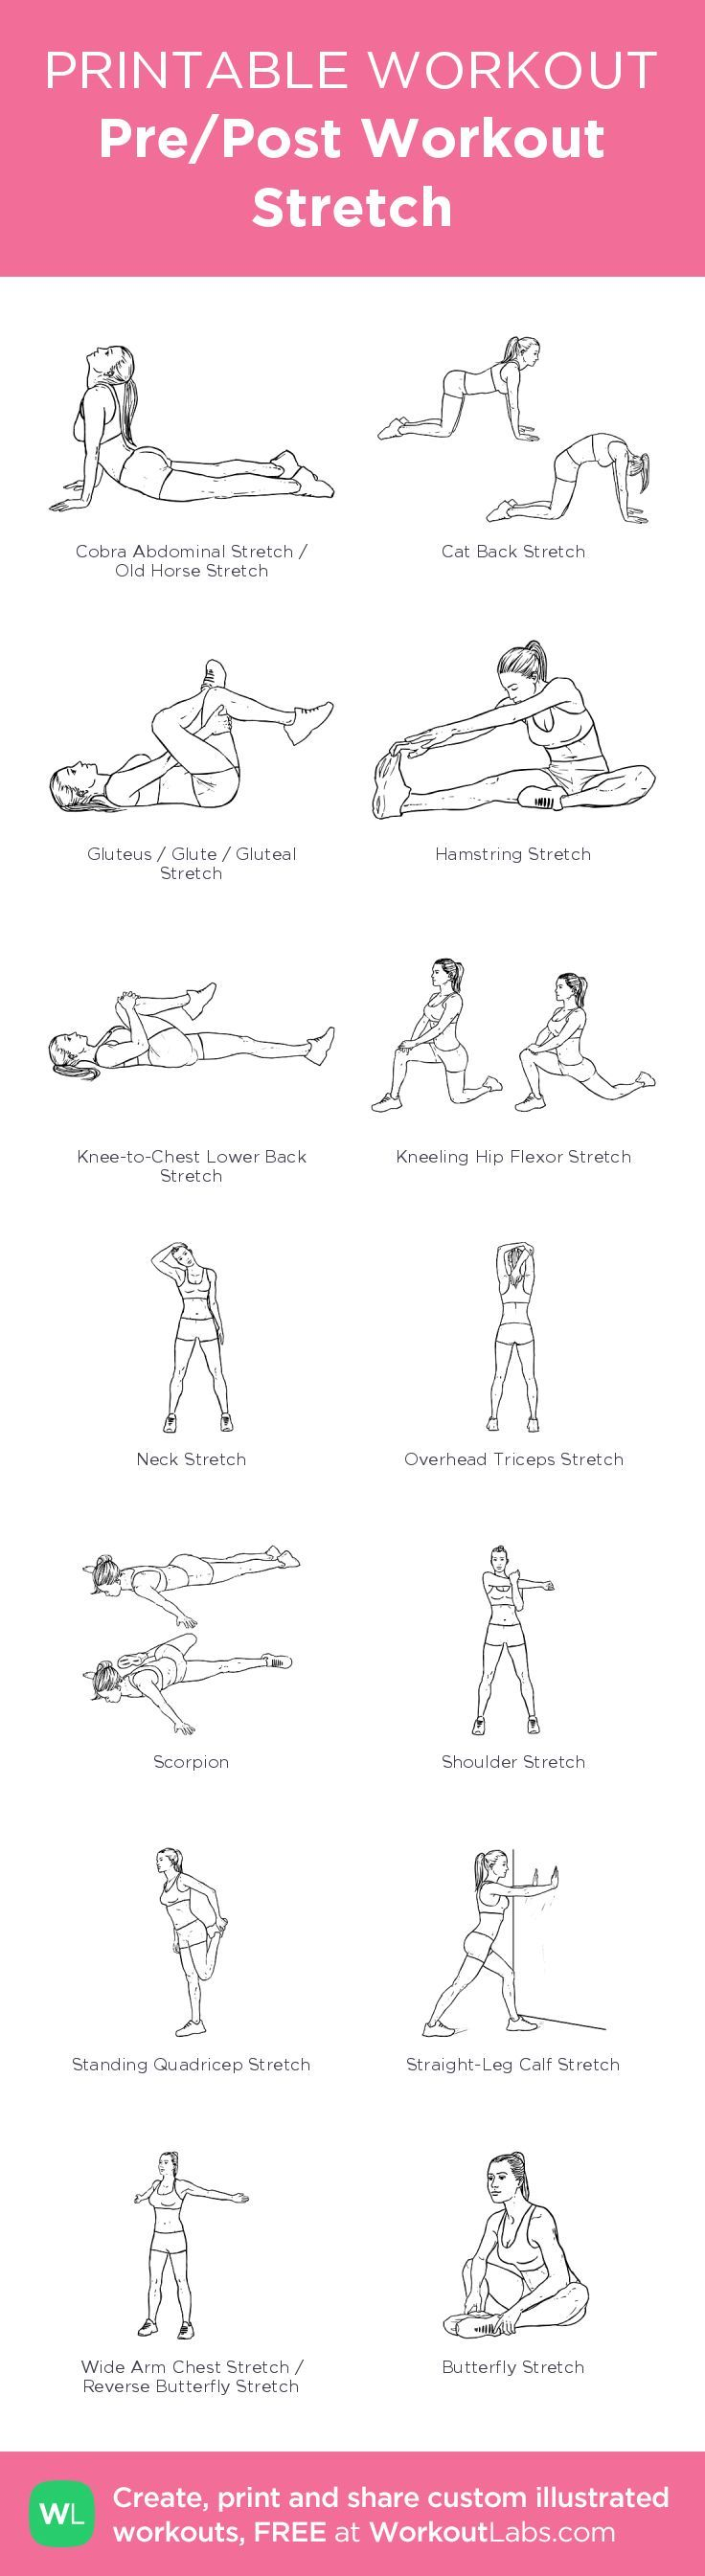 Pre work warm-up stretches pdf